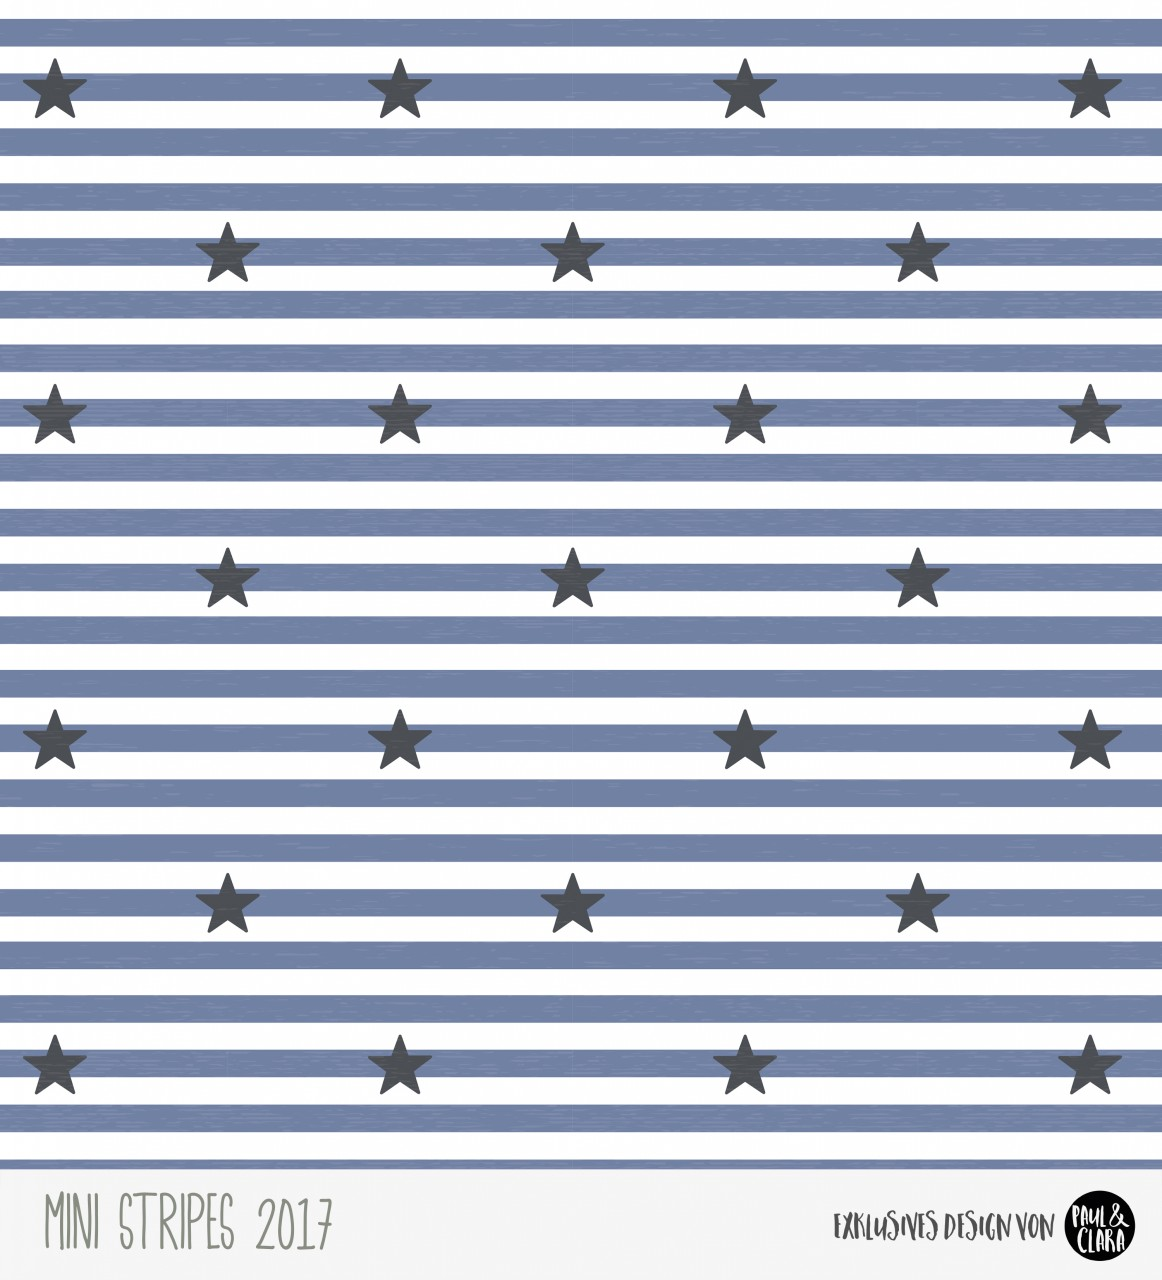 Eigenproduktion Mini Stripes meliert - Sterne Rauchblau/Grau